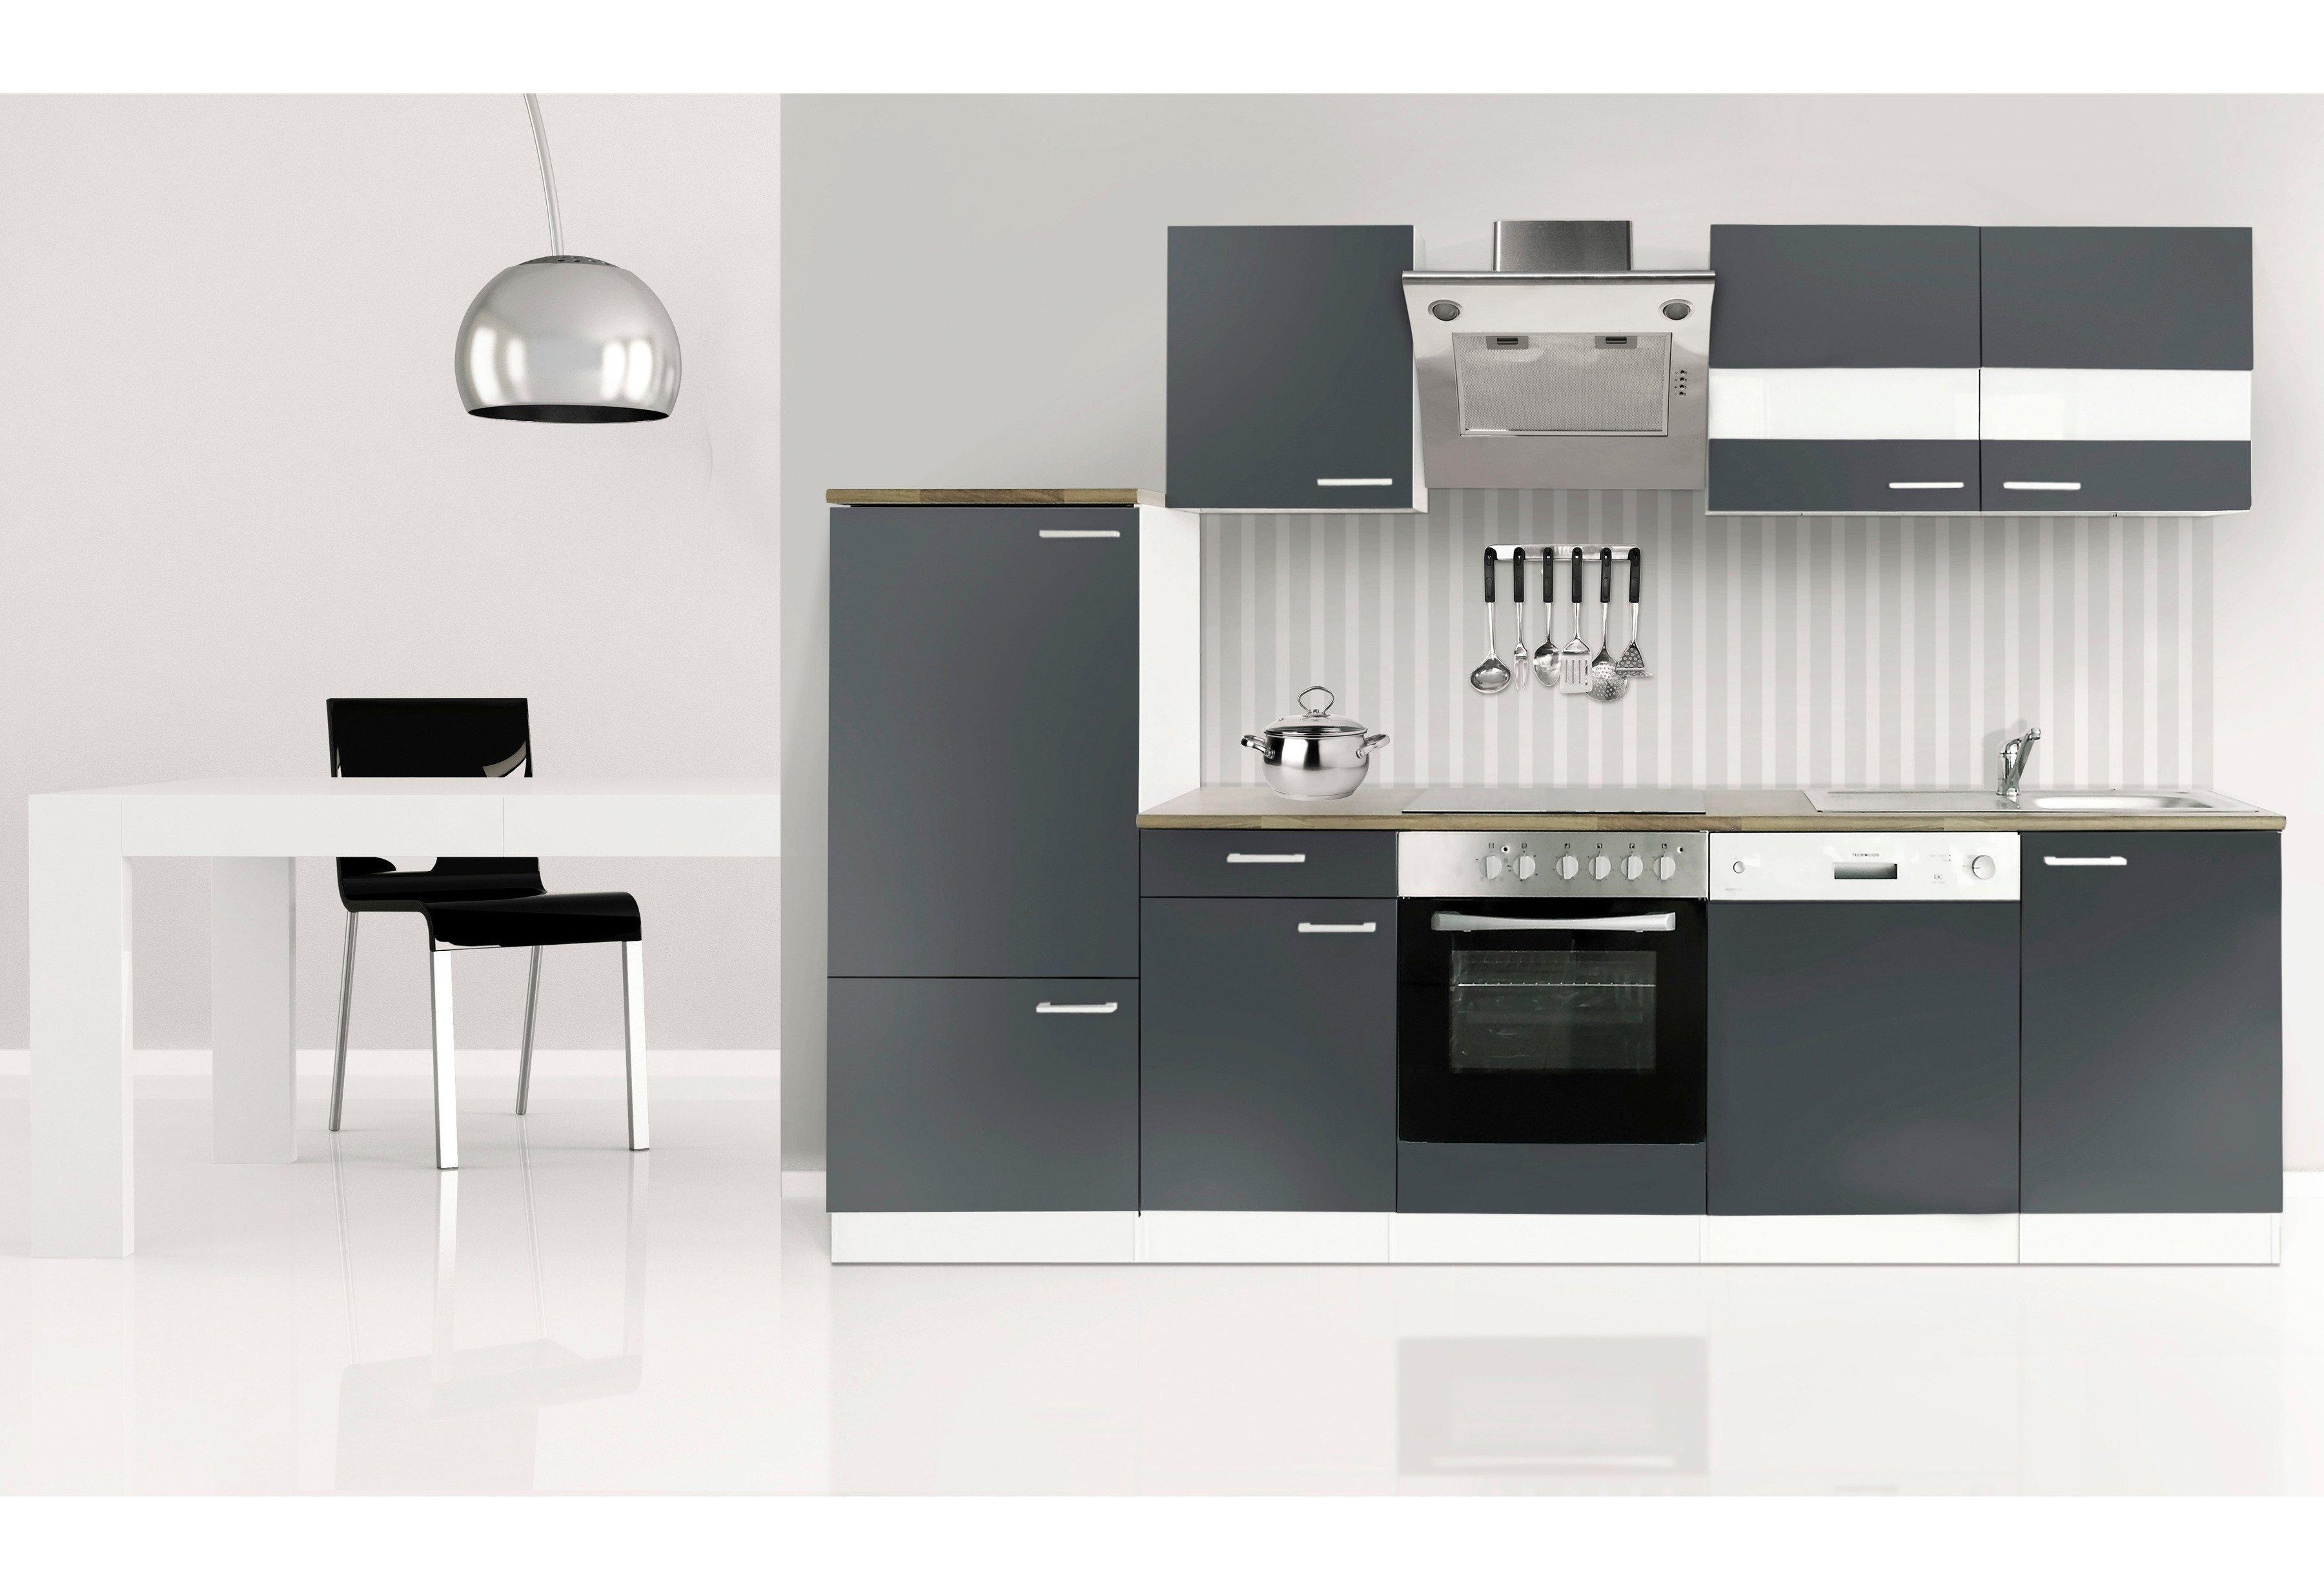 Respekta Kuchenzeile Mit E Geraten Economy Breite 280 Cm Home Decor Furniture Kitchen